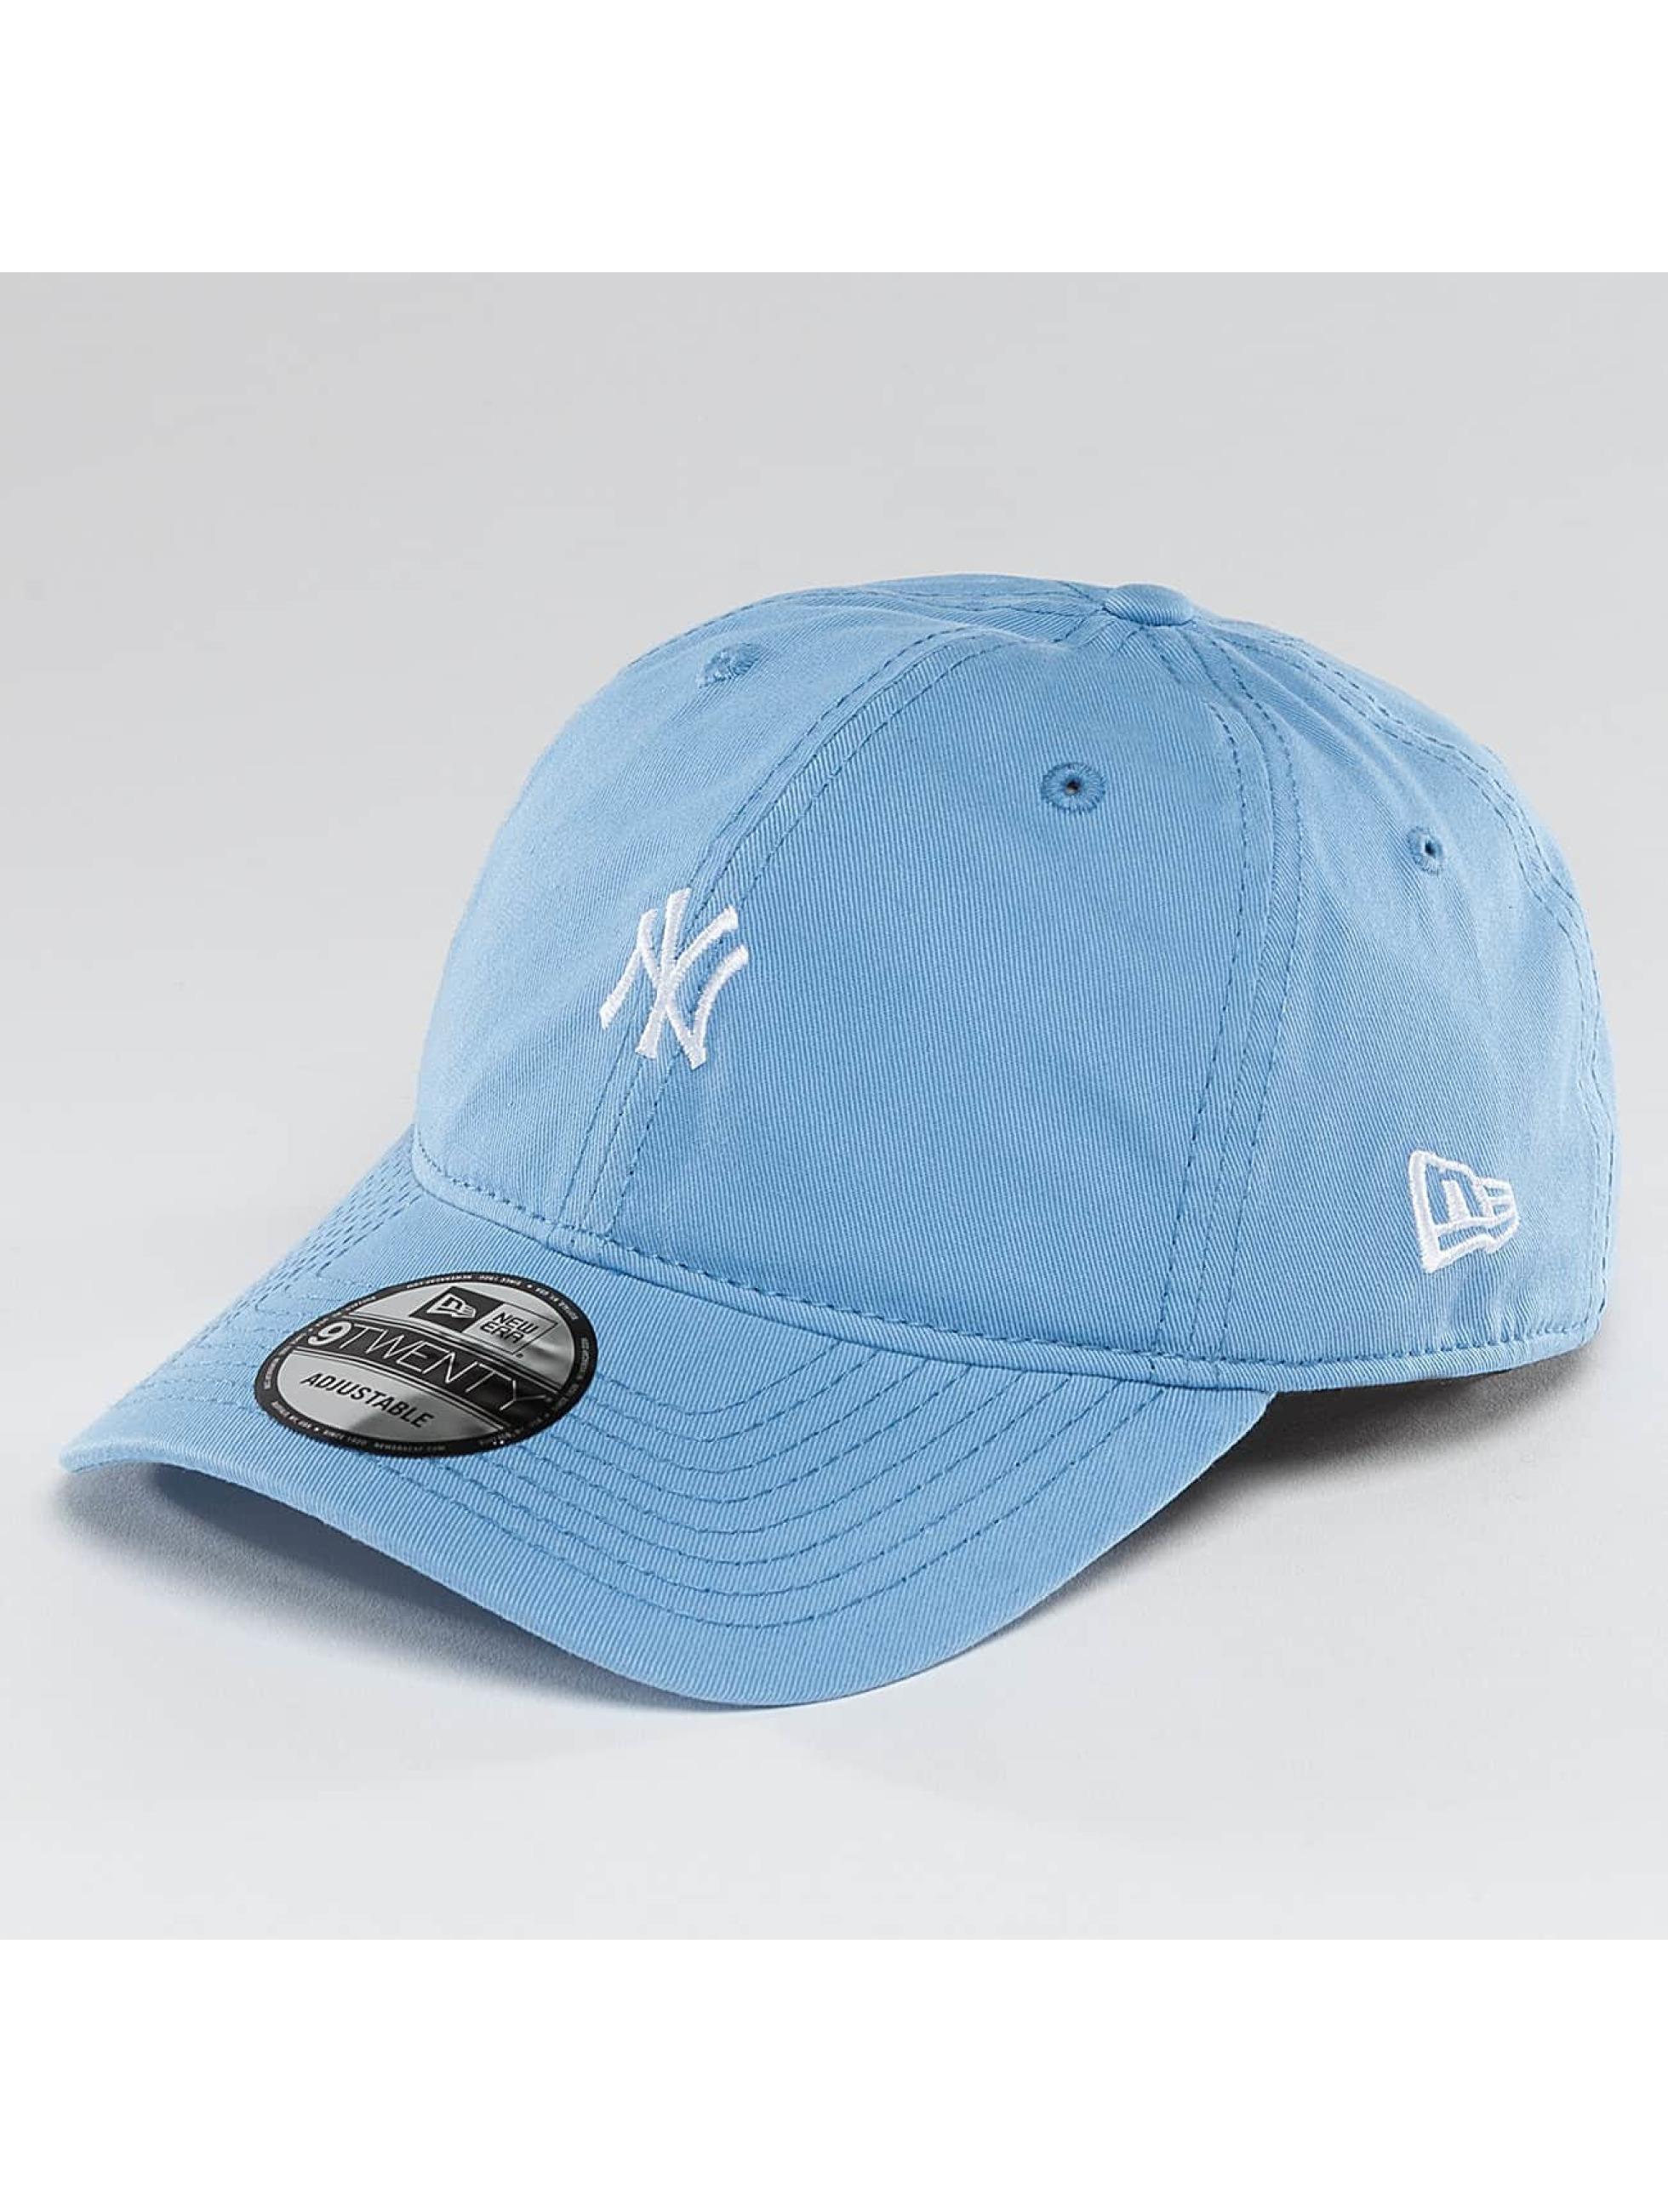 New Era Männer,Frauen Snapback Cap Pastel Micro NY Yankees 9Twenty in blau